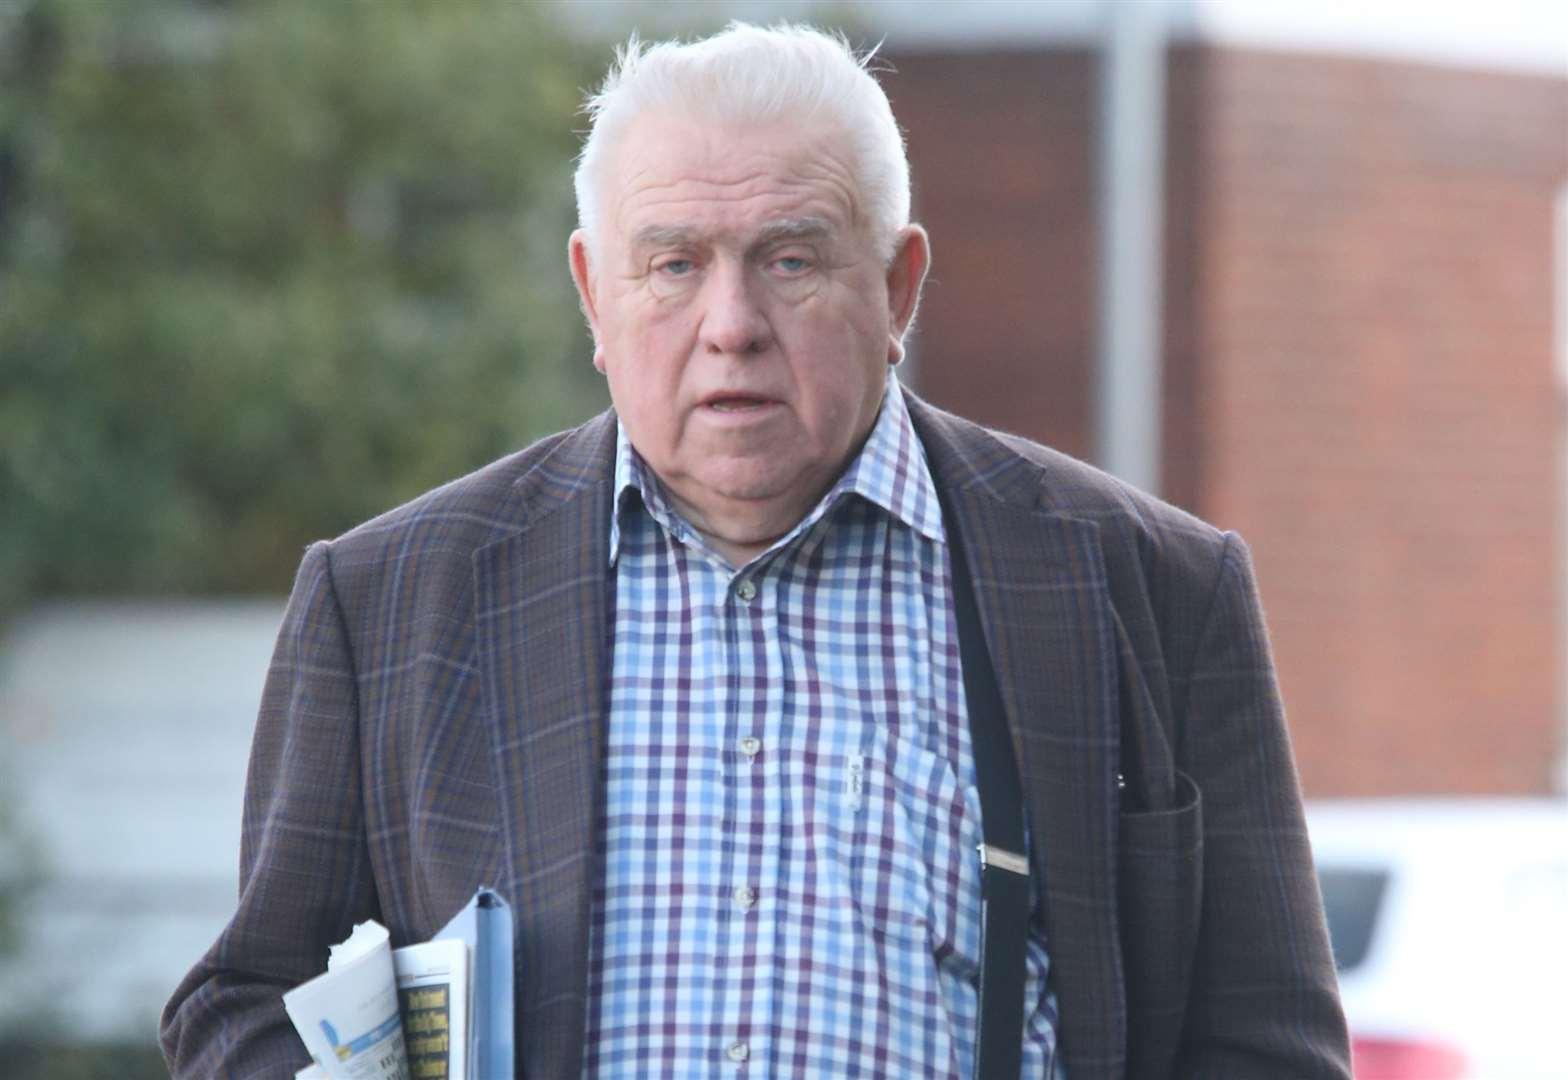 Ex-landlord's racist rant caught on camera - Kent Online